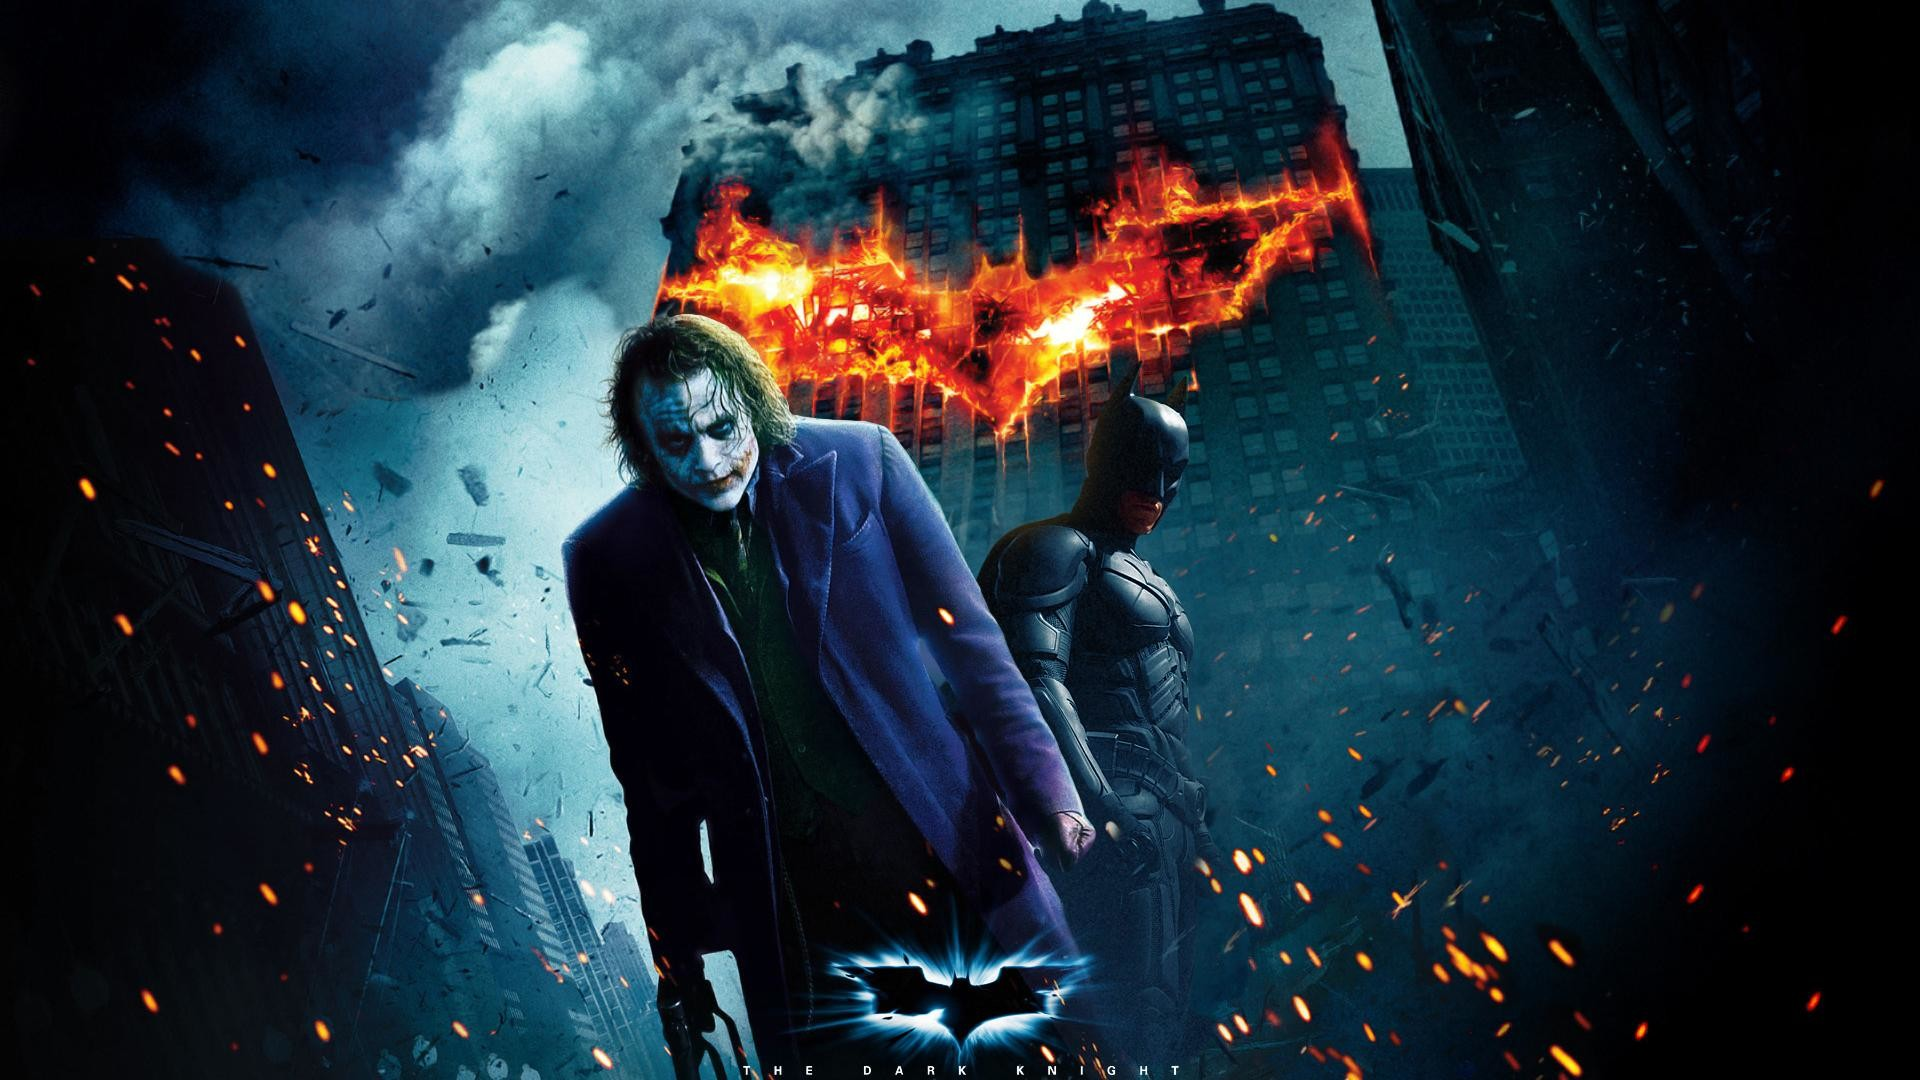 Batman Vs Joker Wallpaper 73 Images